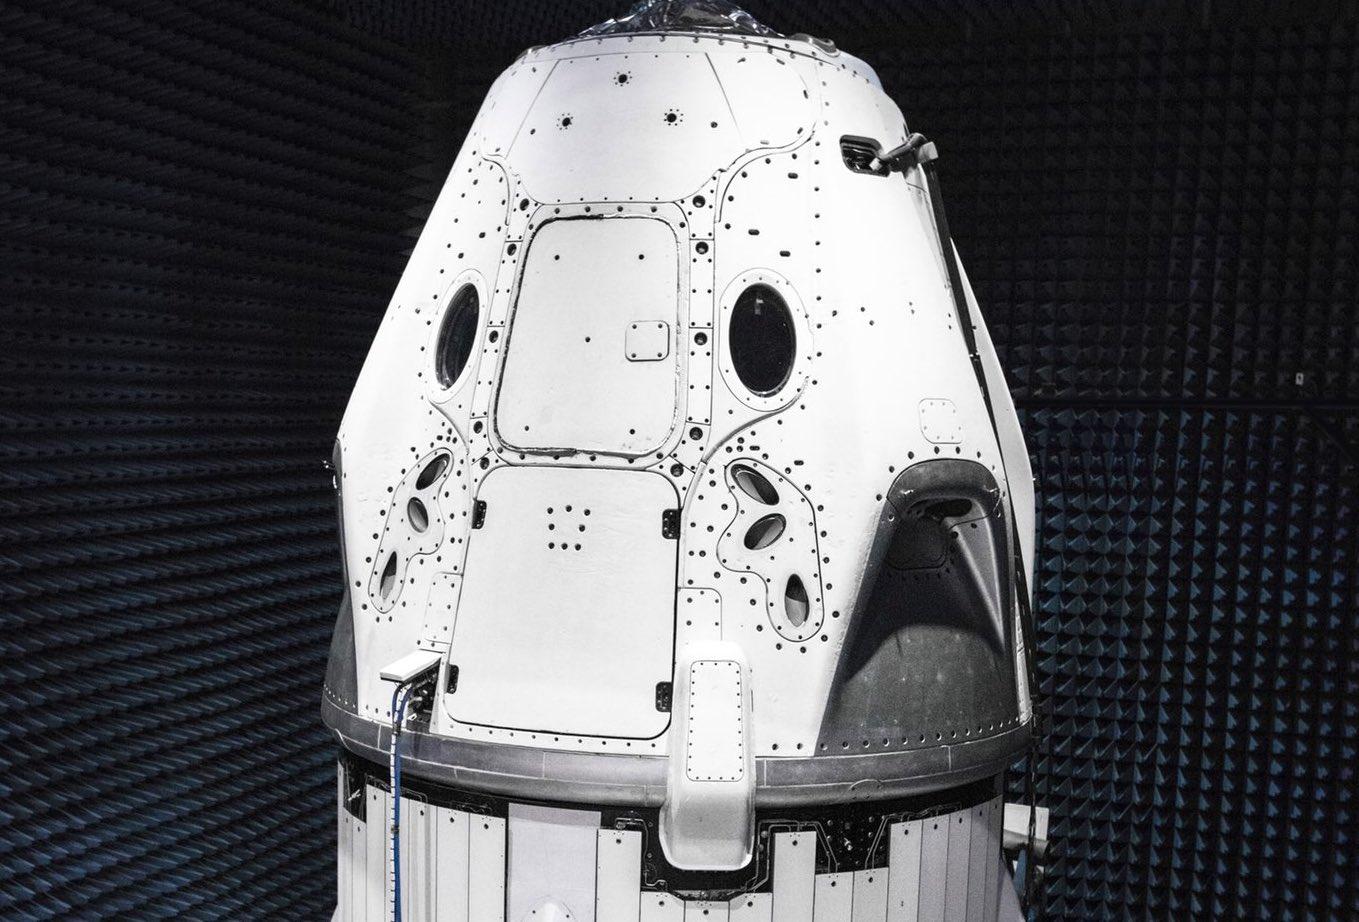 Crew-Dragon-DM-1-May-2018-SpaceX-splash